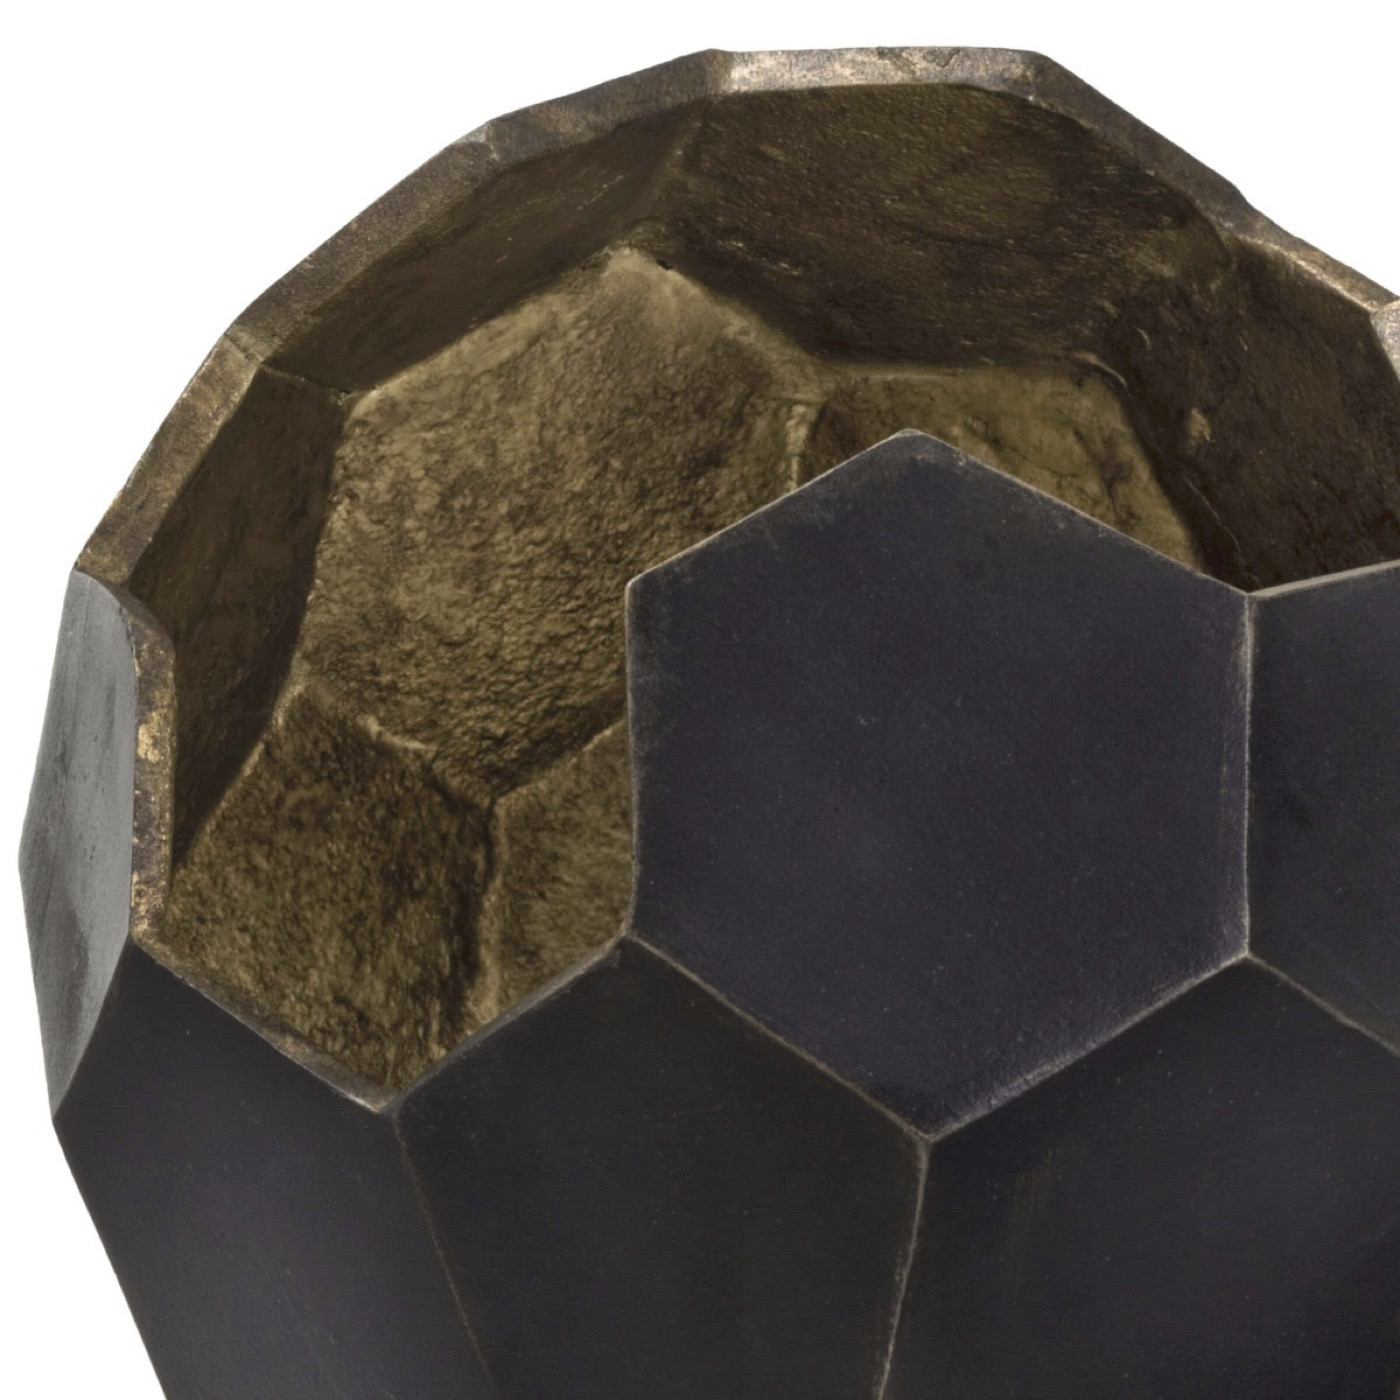 Pluto Polyhedron Metal Vase